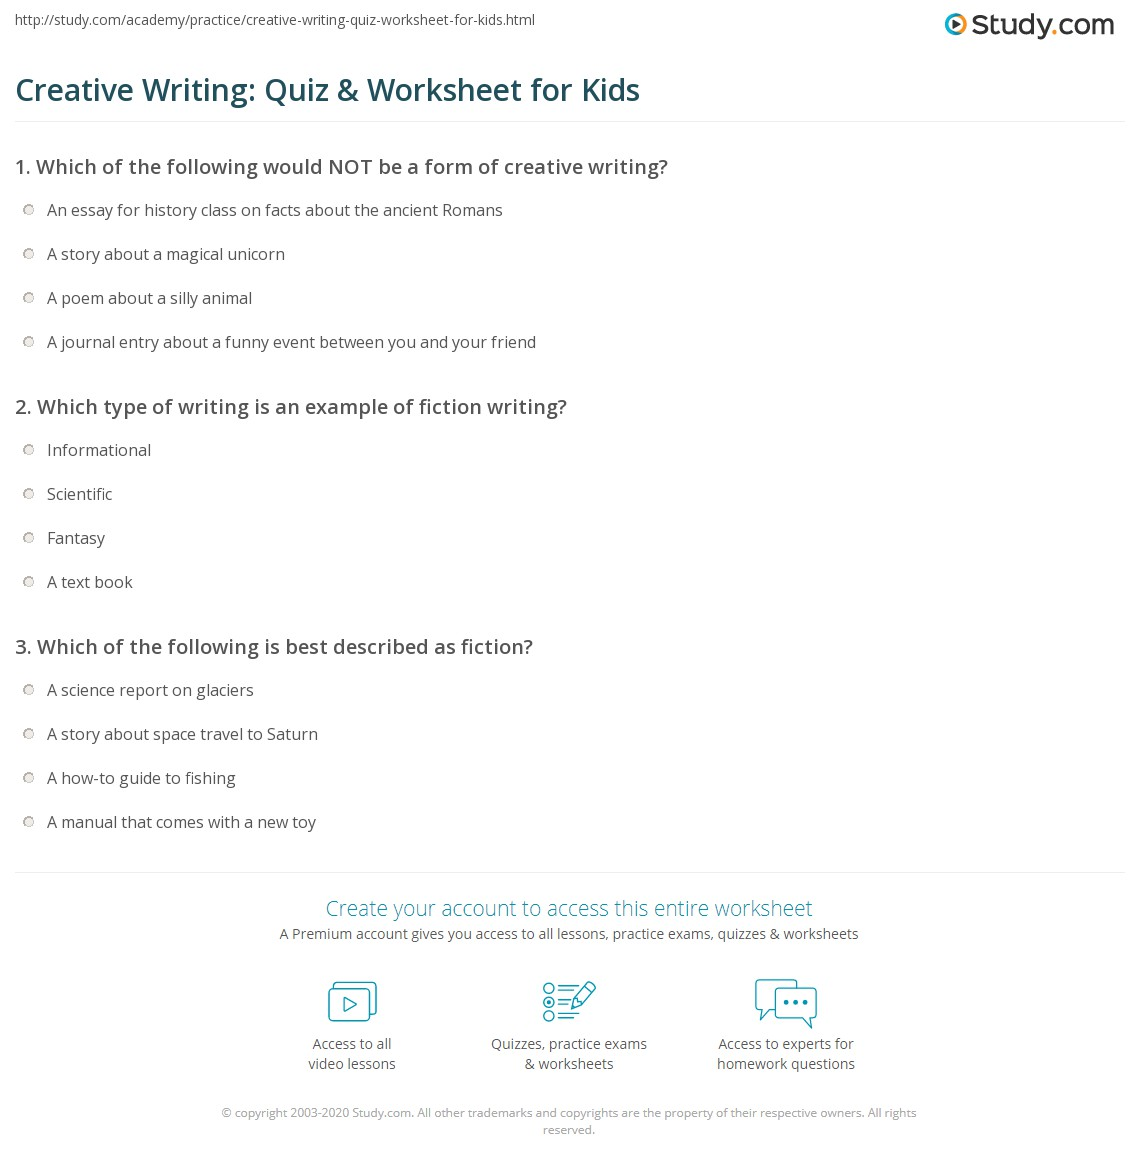 Creative Writing Quiz Worksheet For Kids Study Com